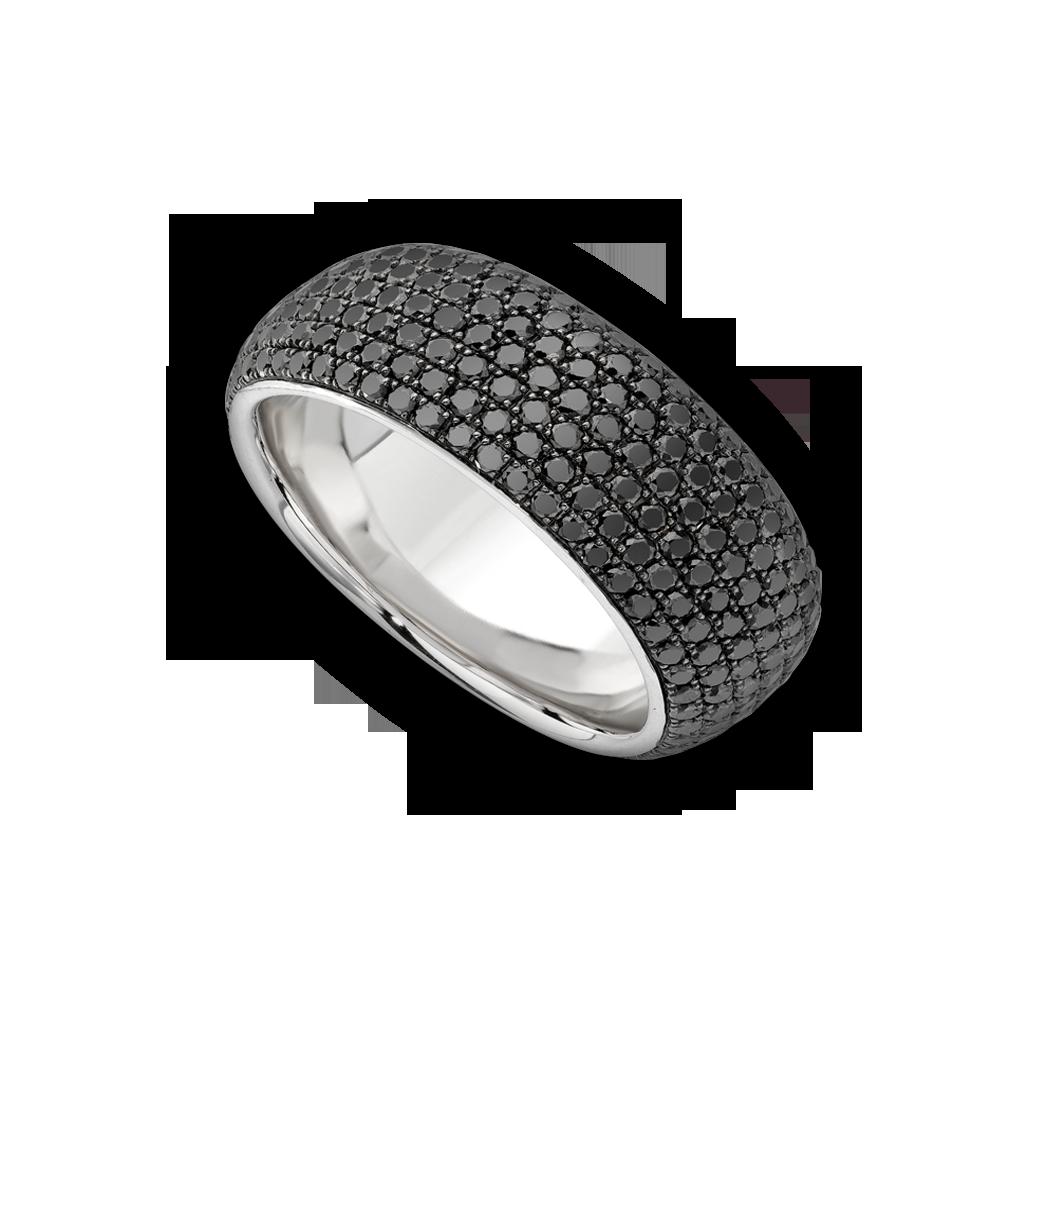 f5caa5b26ba41 Theo Fennell - White Gold & Black Diamond 7 Row Spangle Ring   Fine ...